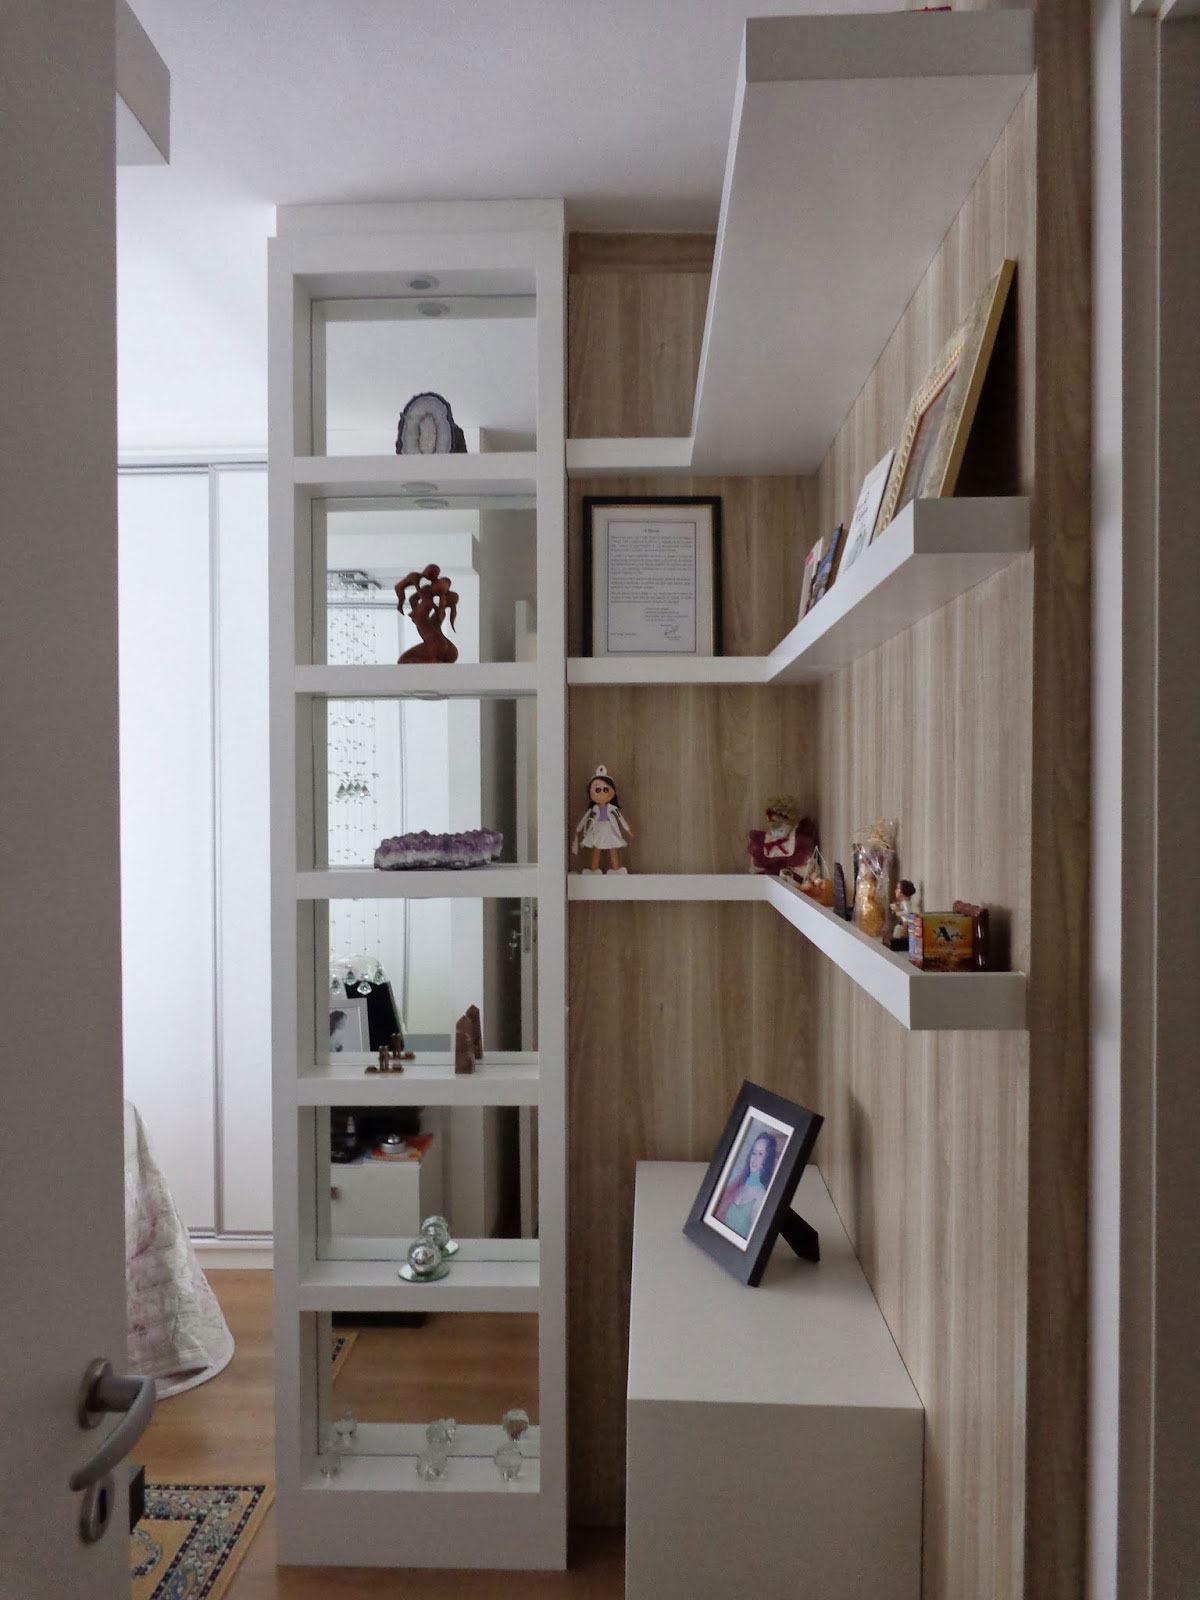 HD wallpapers quadros decorativos para quarto de casal